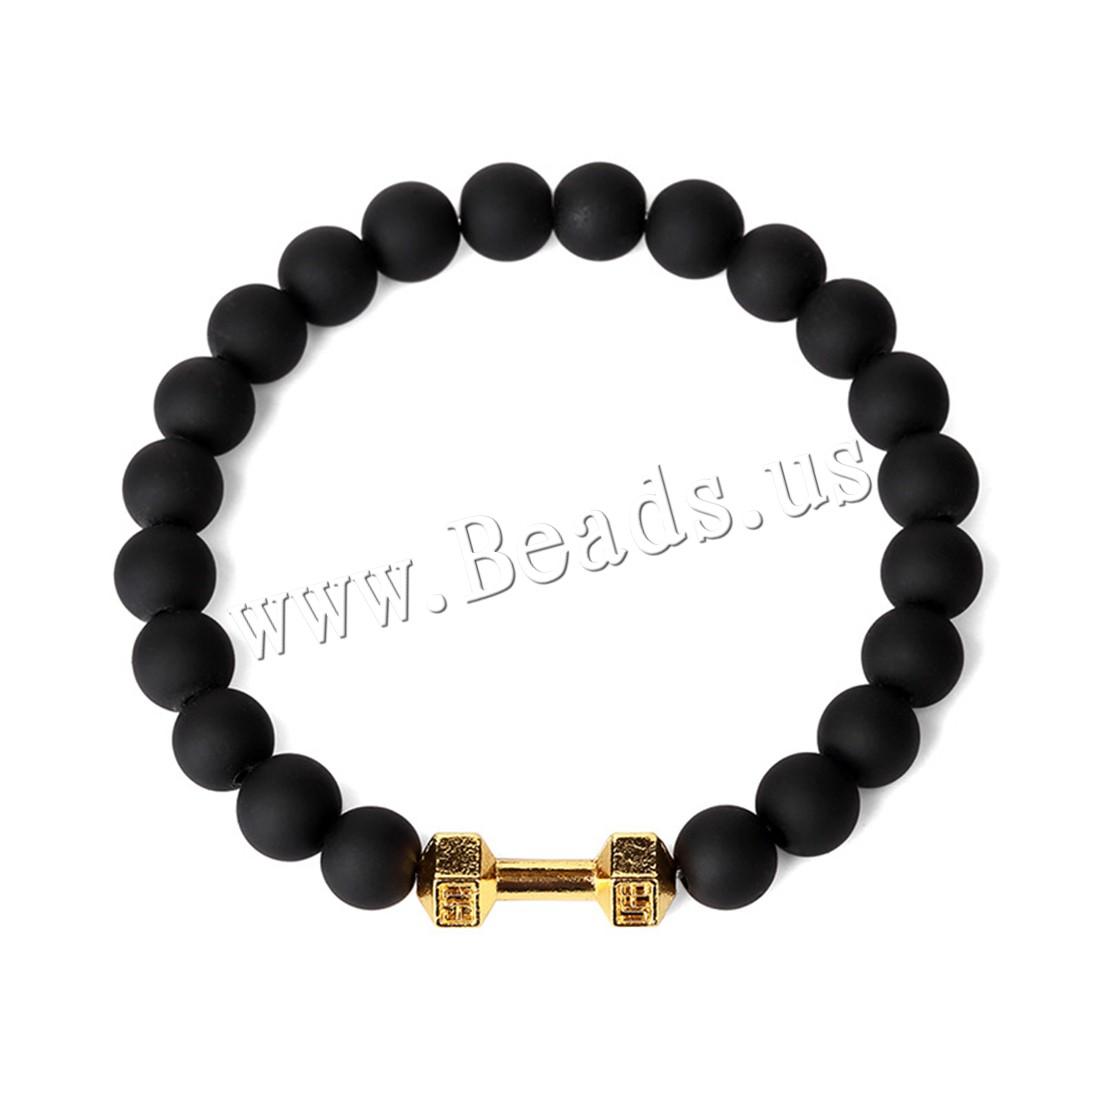 Unisex Bracelet Rubber Zinc Alloy gold color plated beaded bracelet 20x8mm 8mm Sold Per Approx 7.8 Inch Strand